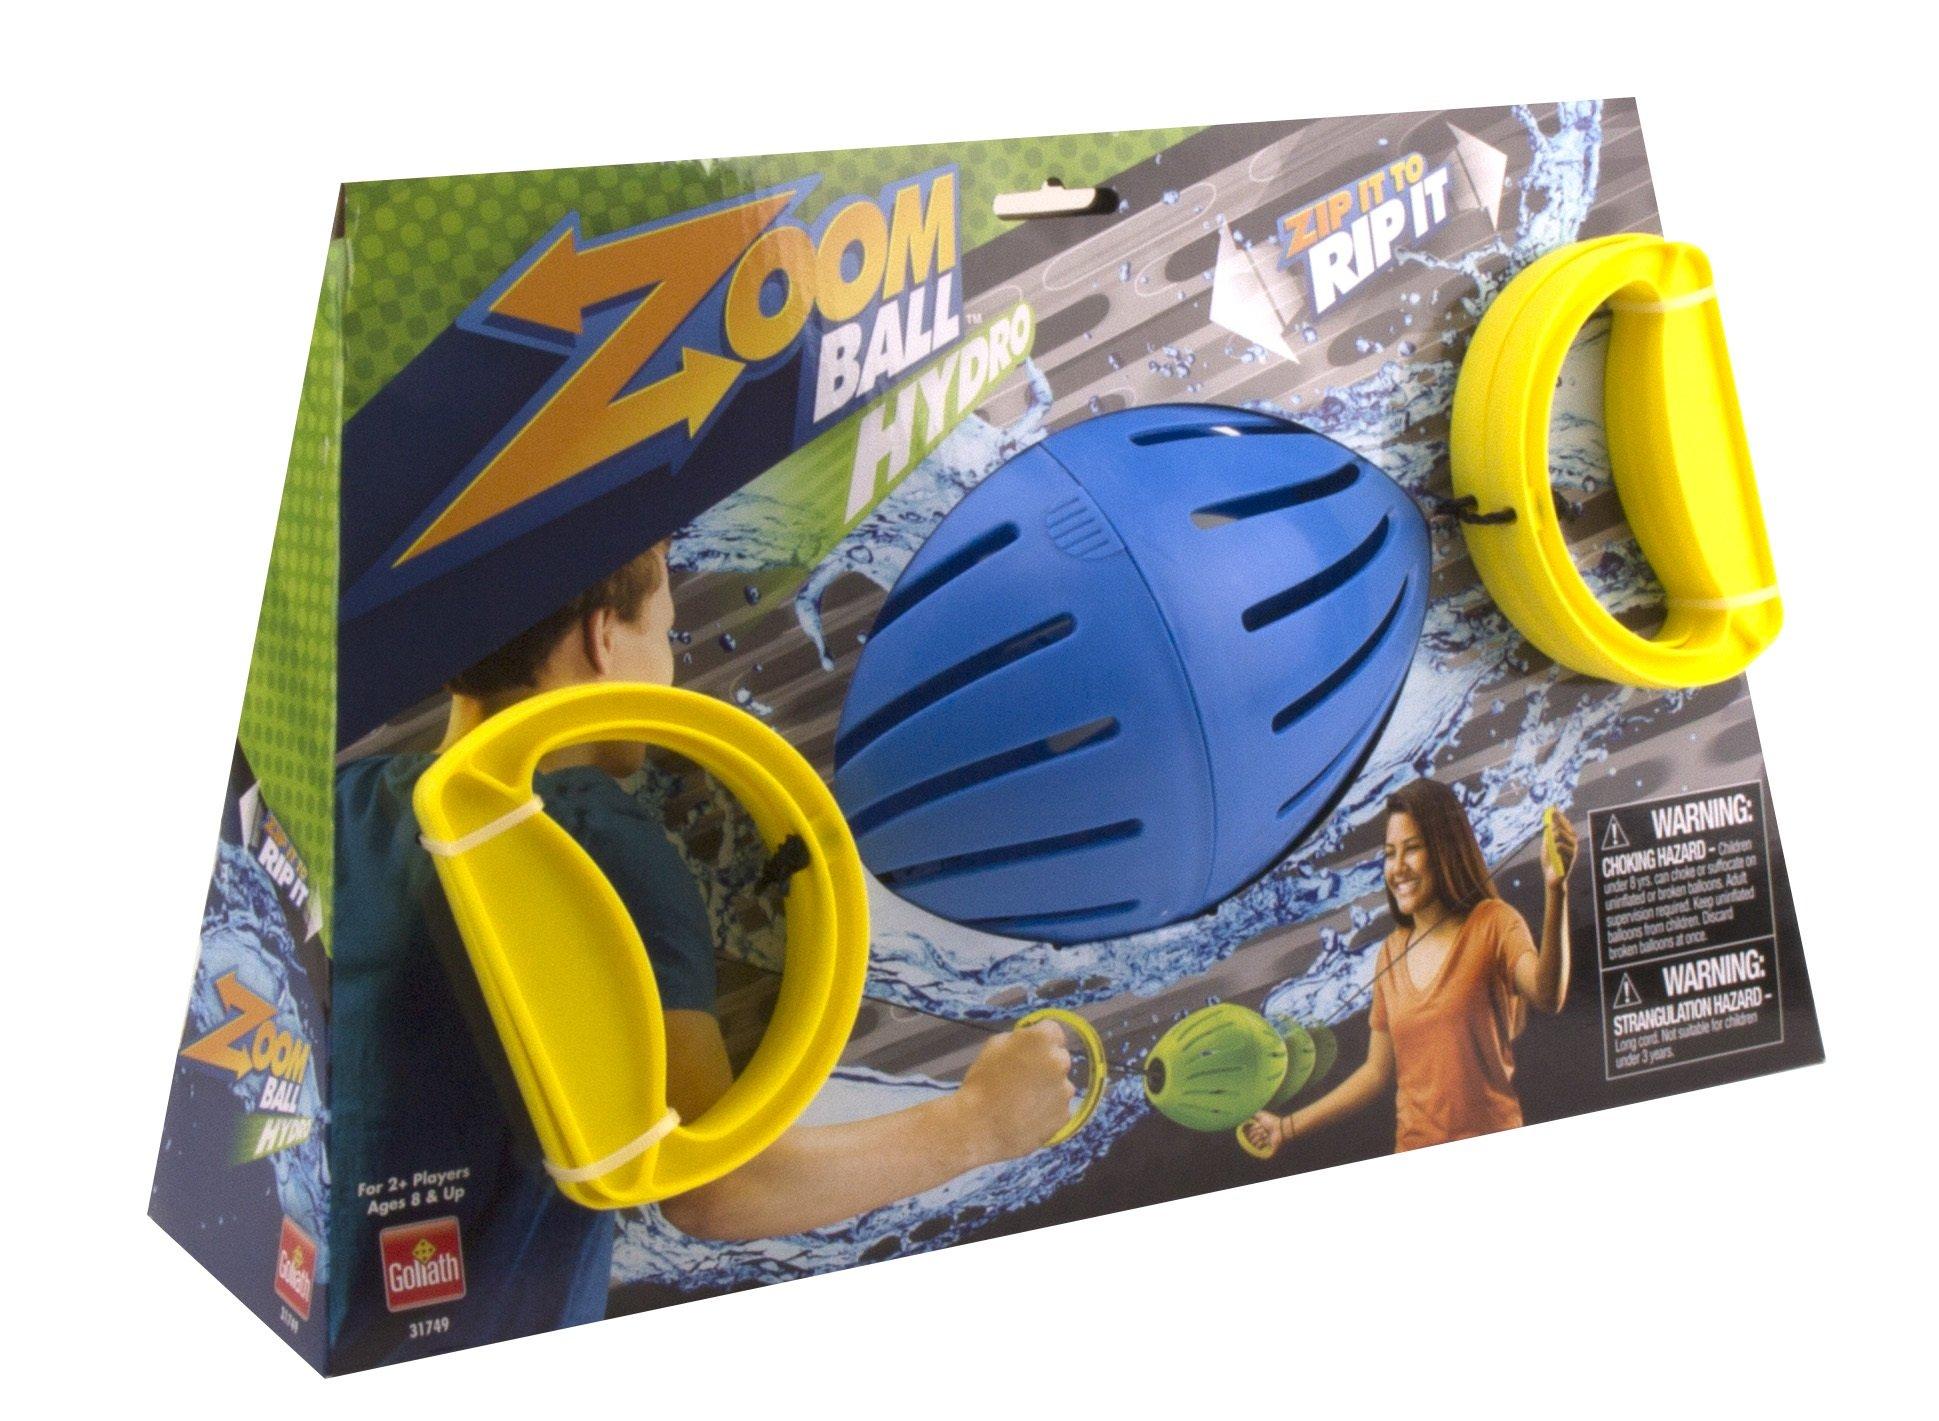 Goliath Hydro Zoom Ball (2 Player)